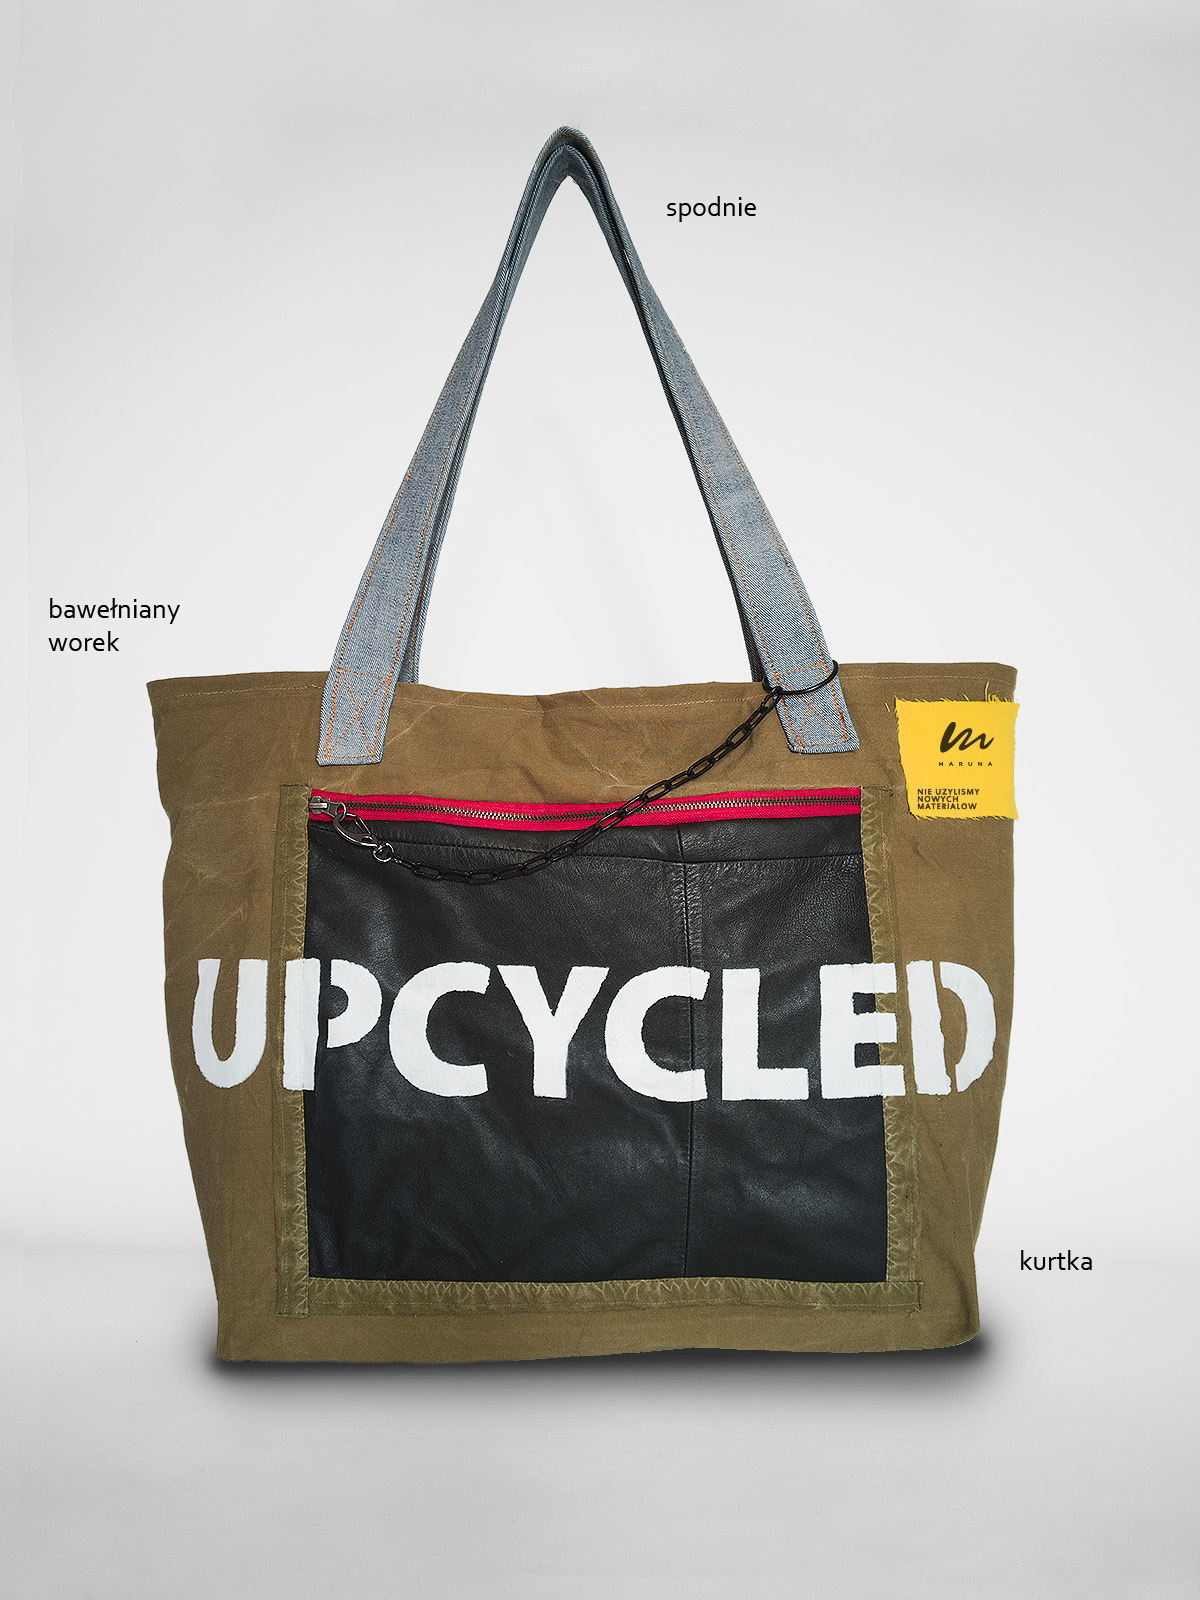 torba pocket upcycled